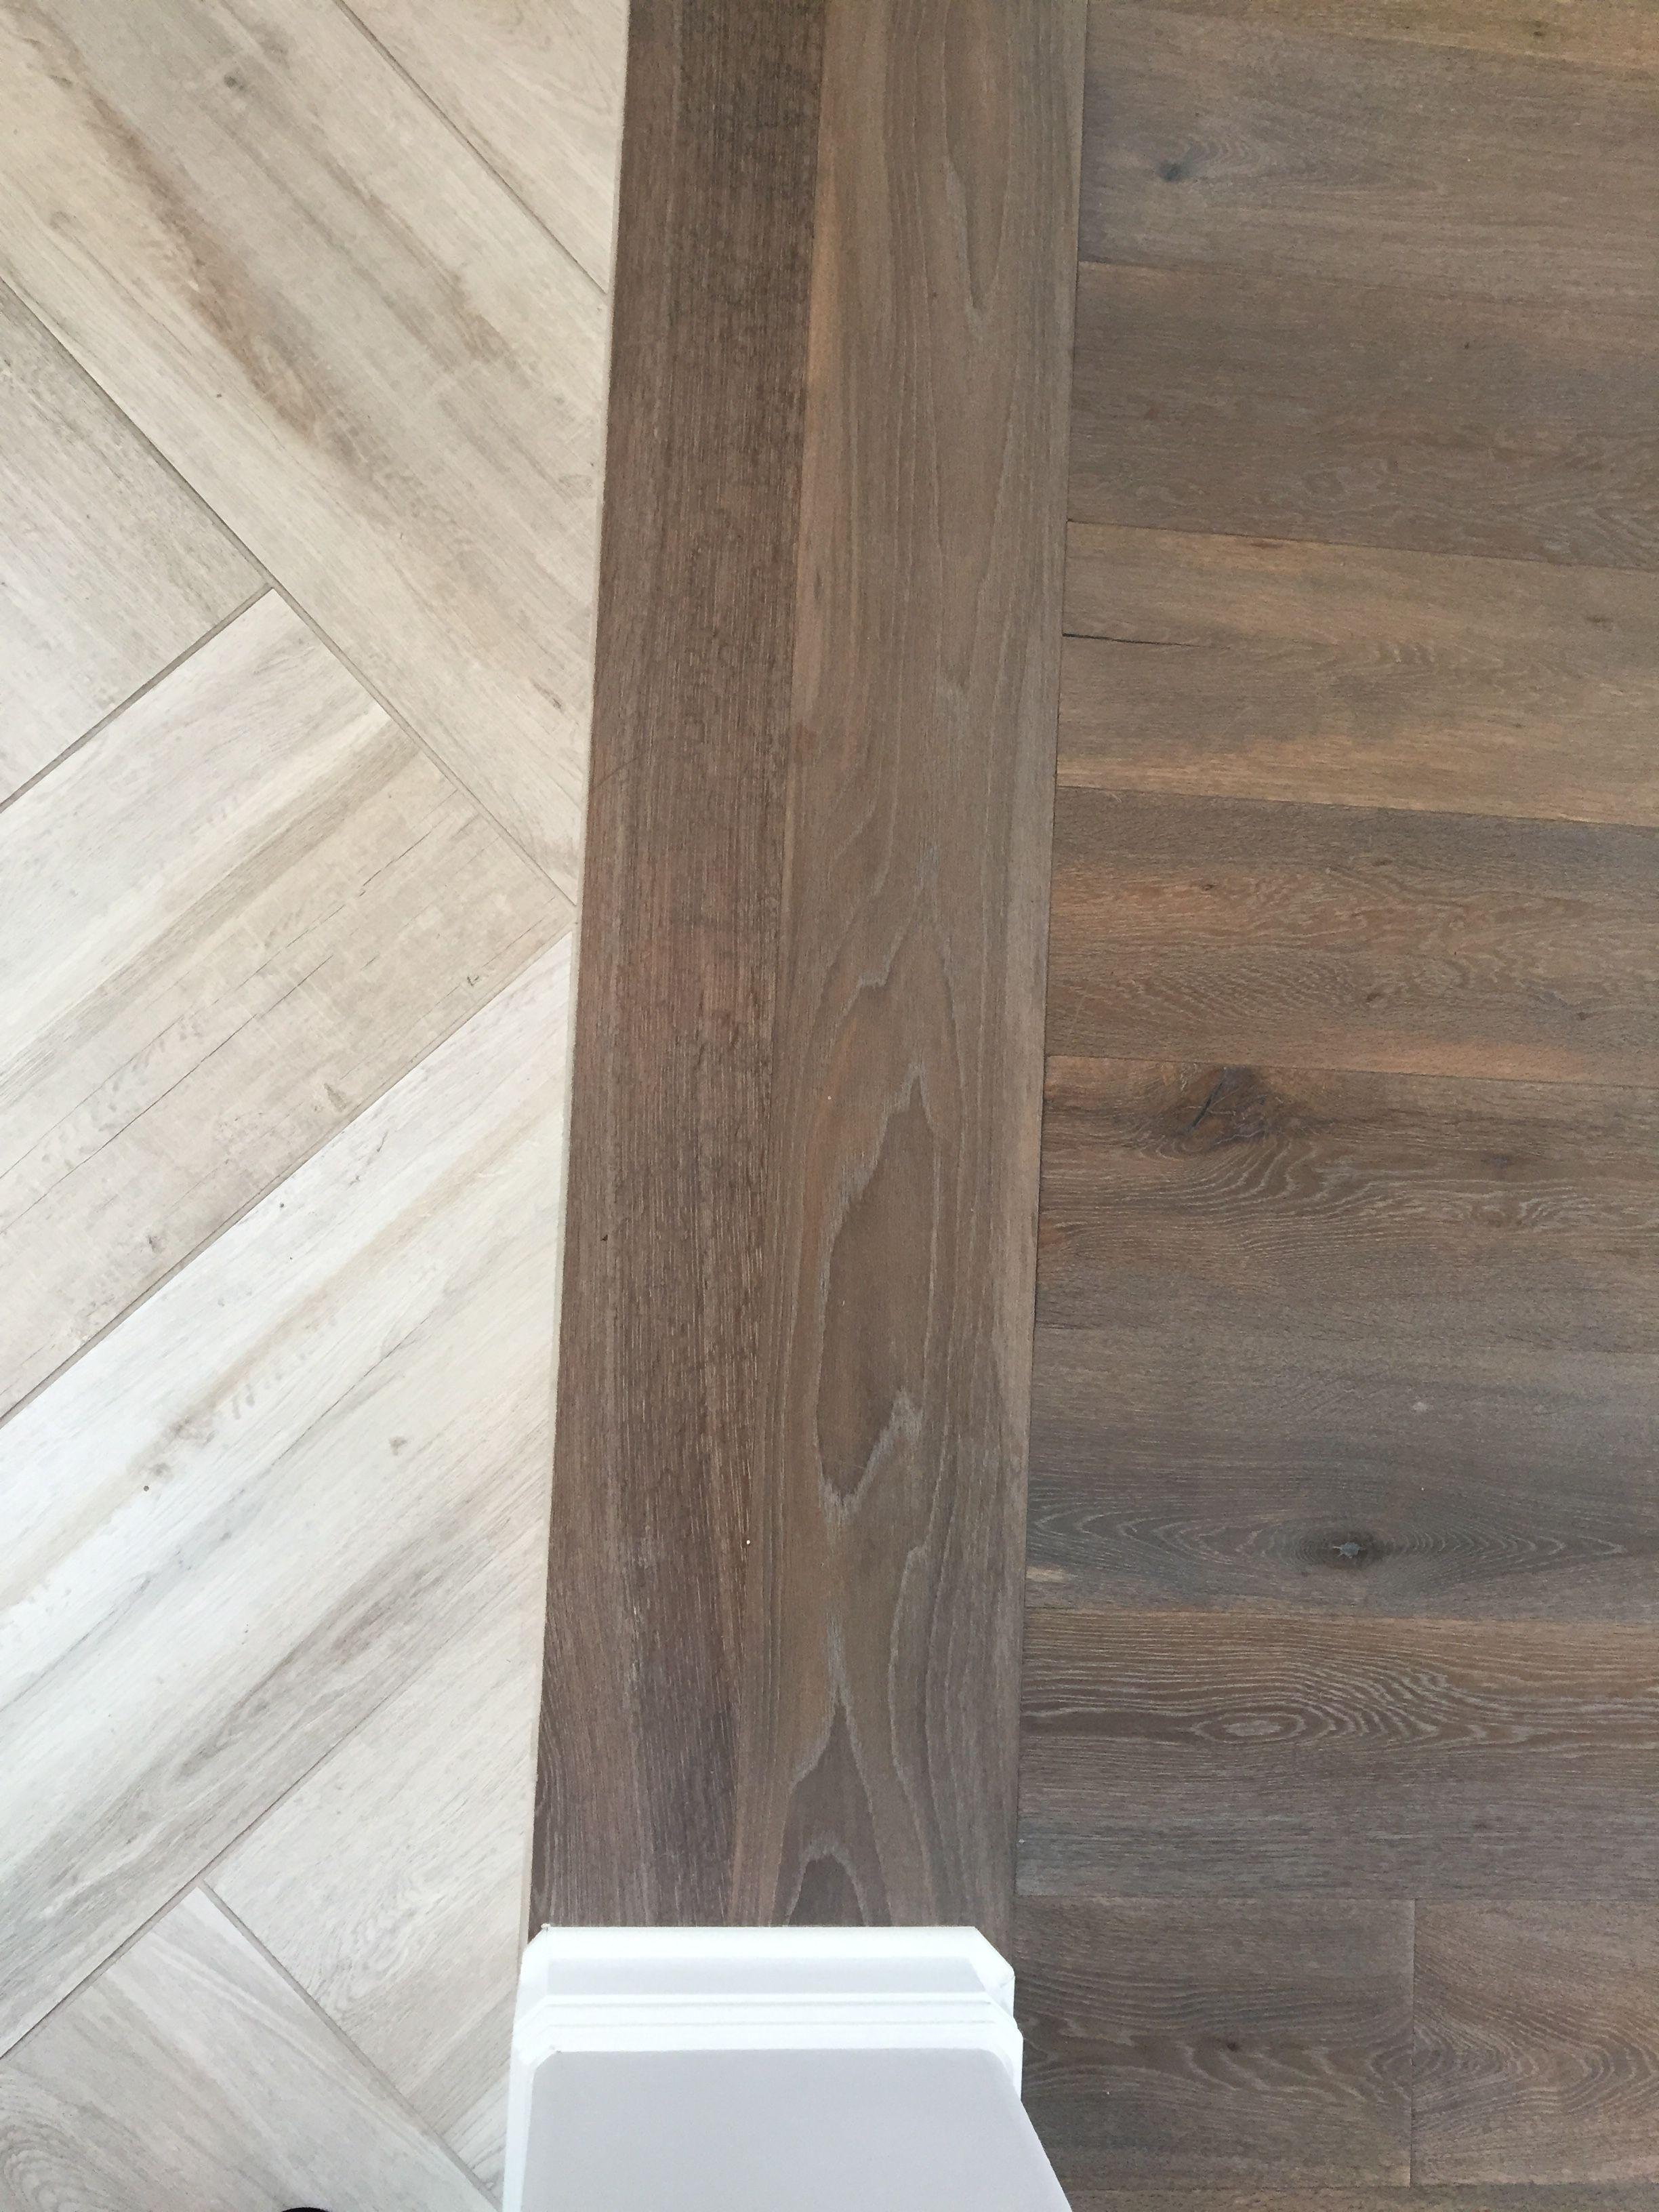 laminate wood flooring versus hardwood flooring of floor transition laminate to herringbone tile pattern model with regard to floor transition laminate to herringbone tile pattern herringbone tile pattern herringbone wood floor